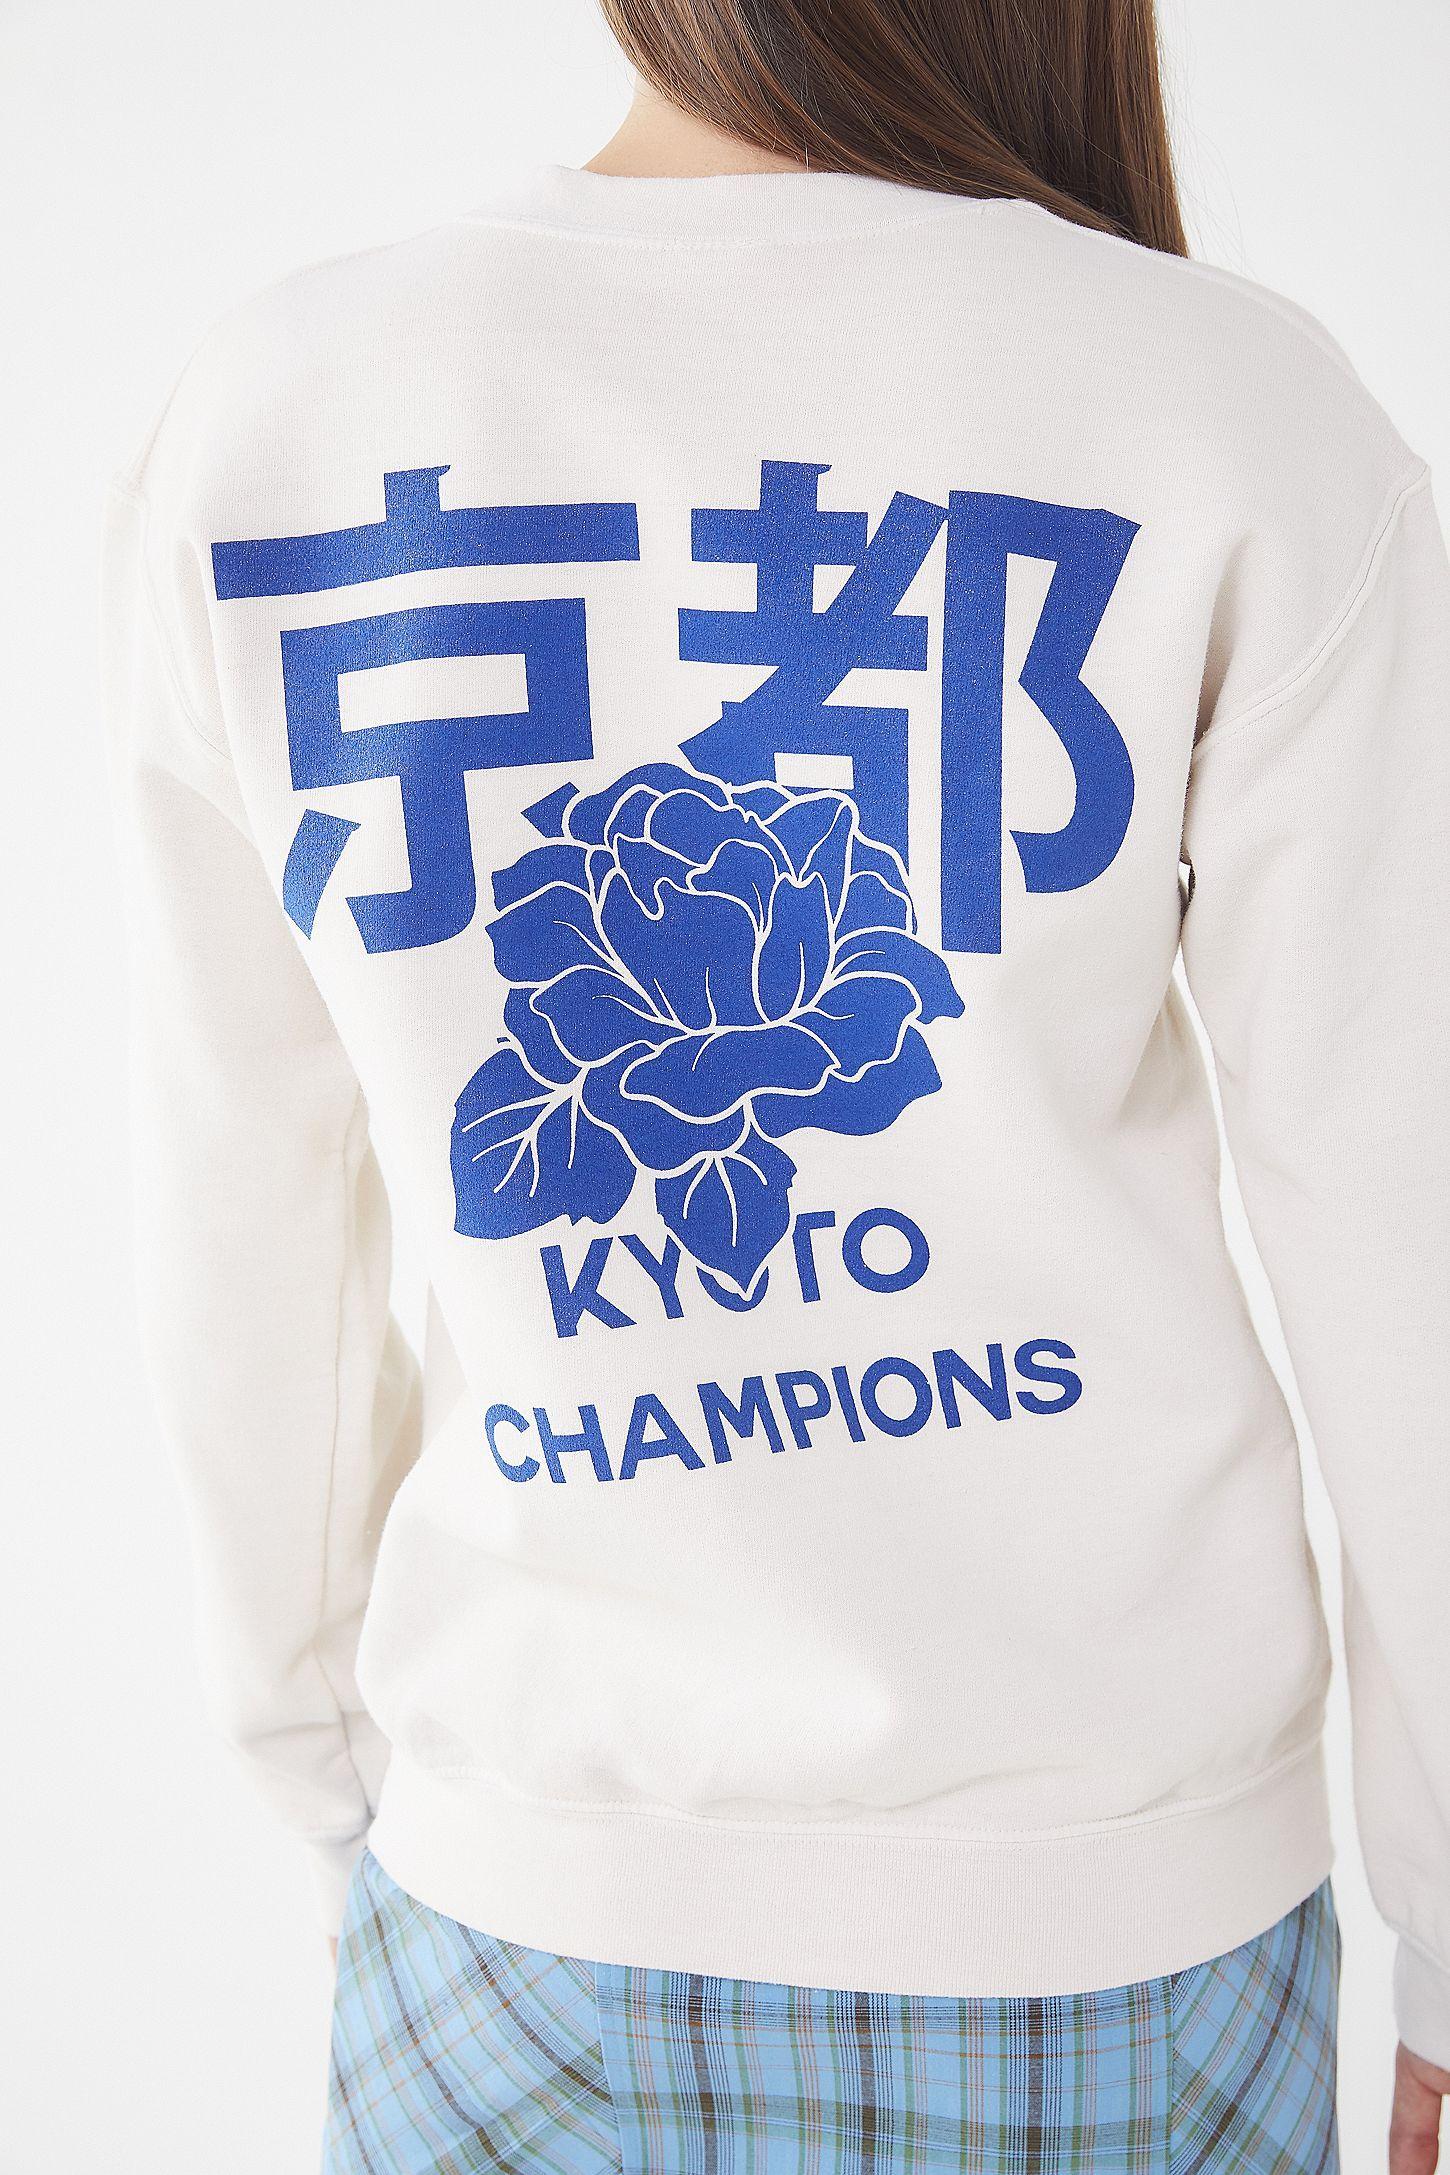 cb2d2d89 Kyoto Champions Overdyed Sweatshirt   Wish list   Sweatshirts, Urban ...